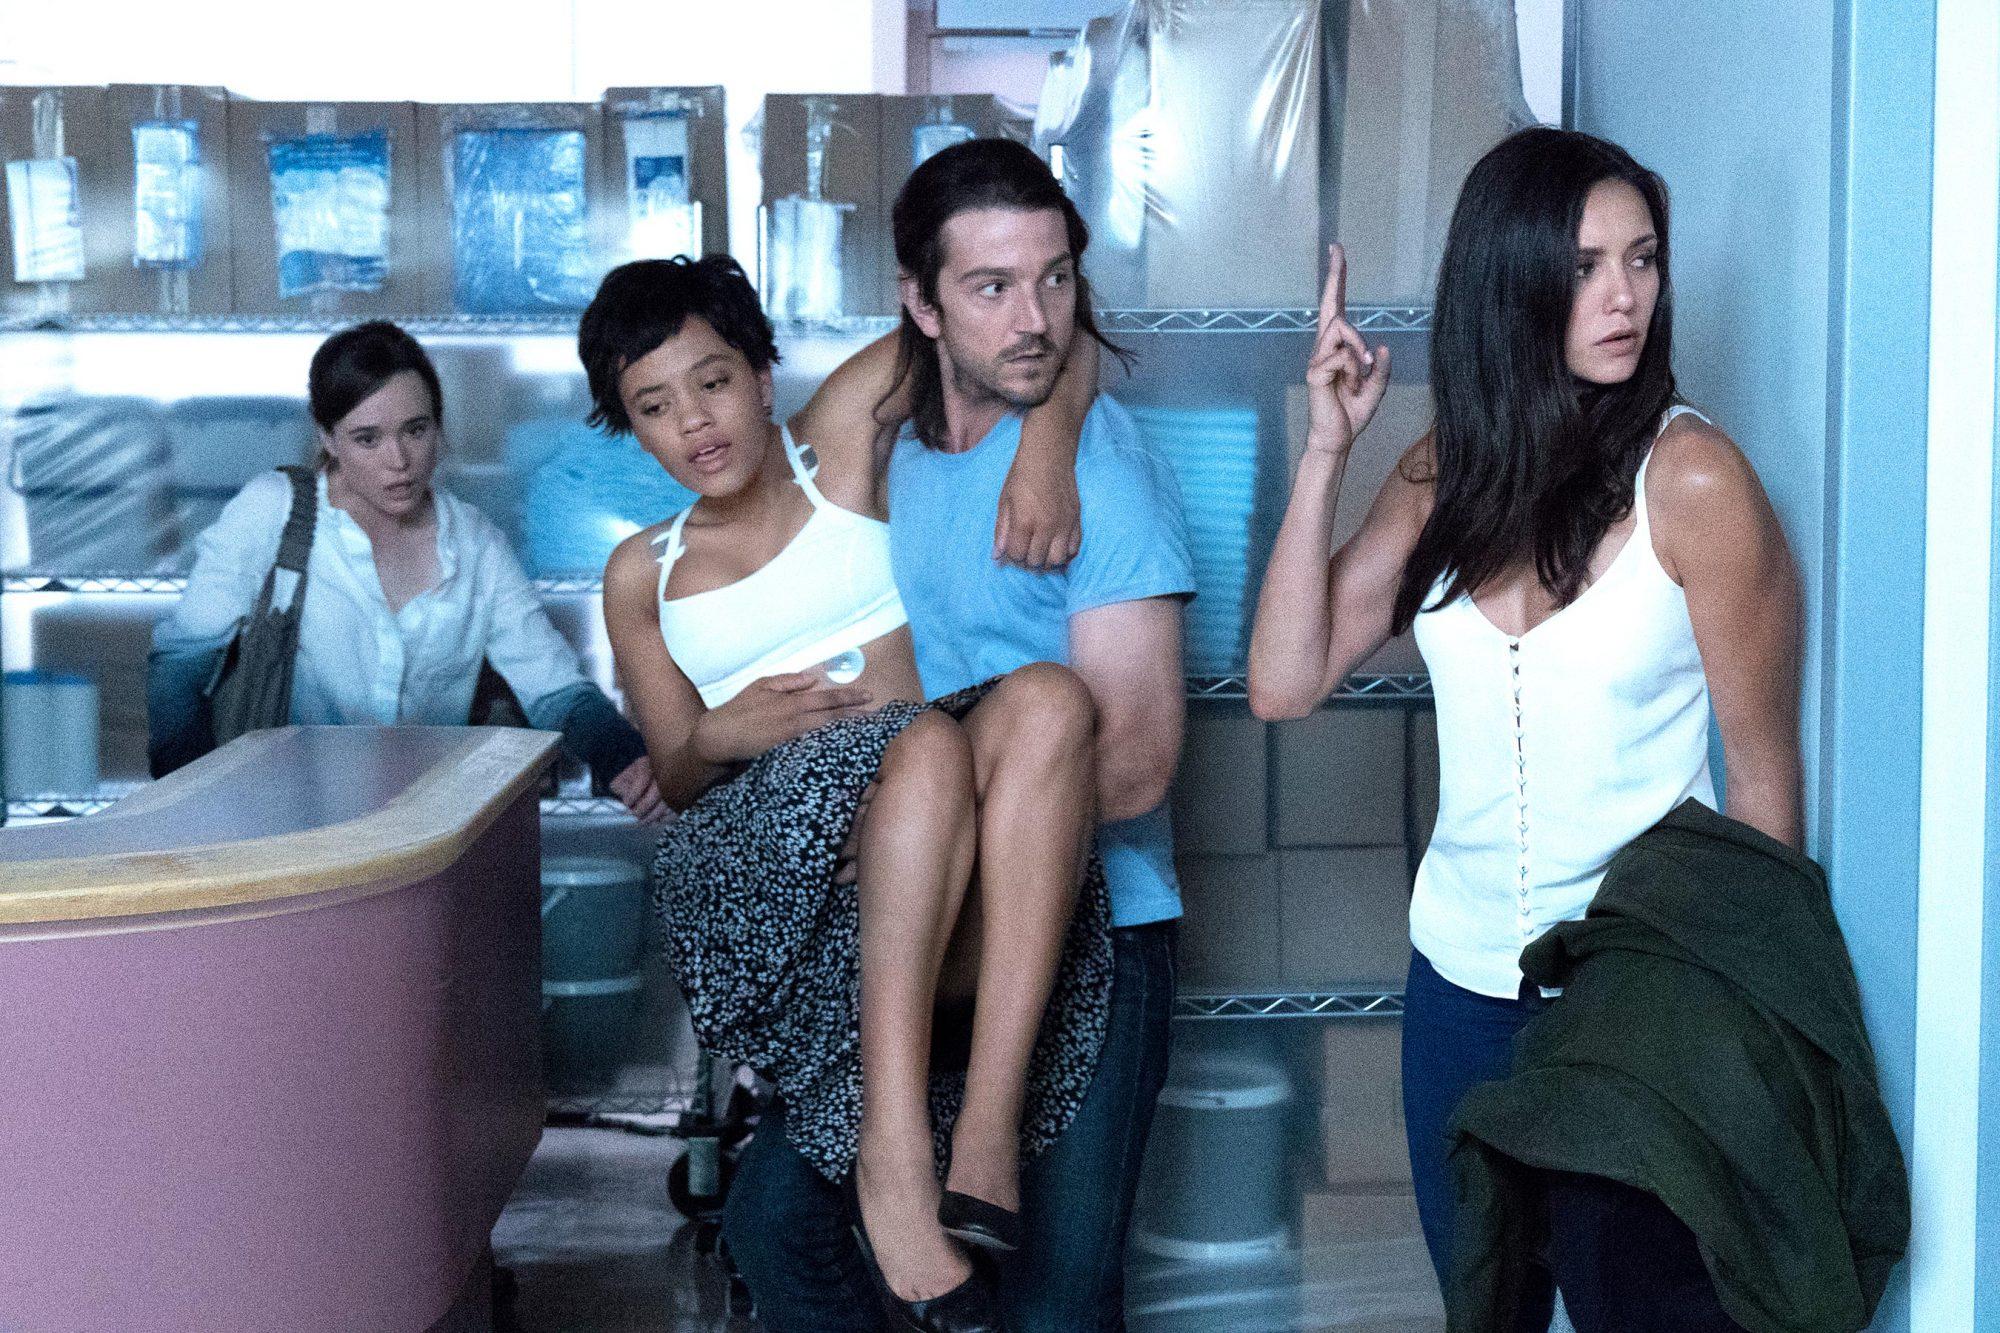 Ellen Page;Diego Luna;Nina Dobrev;Kiersey Clemons